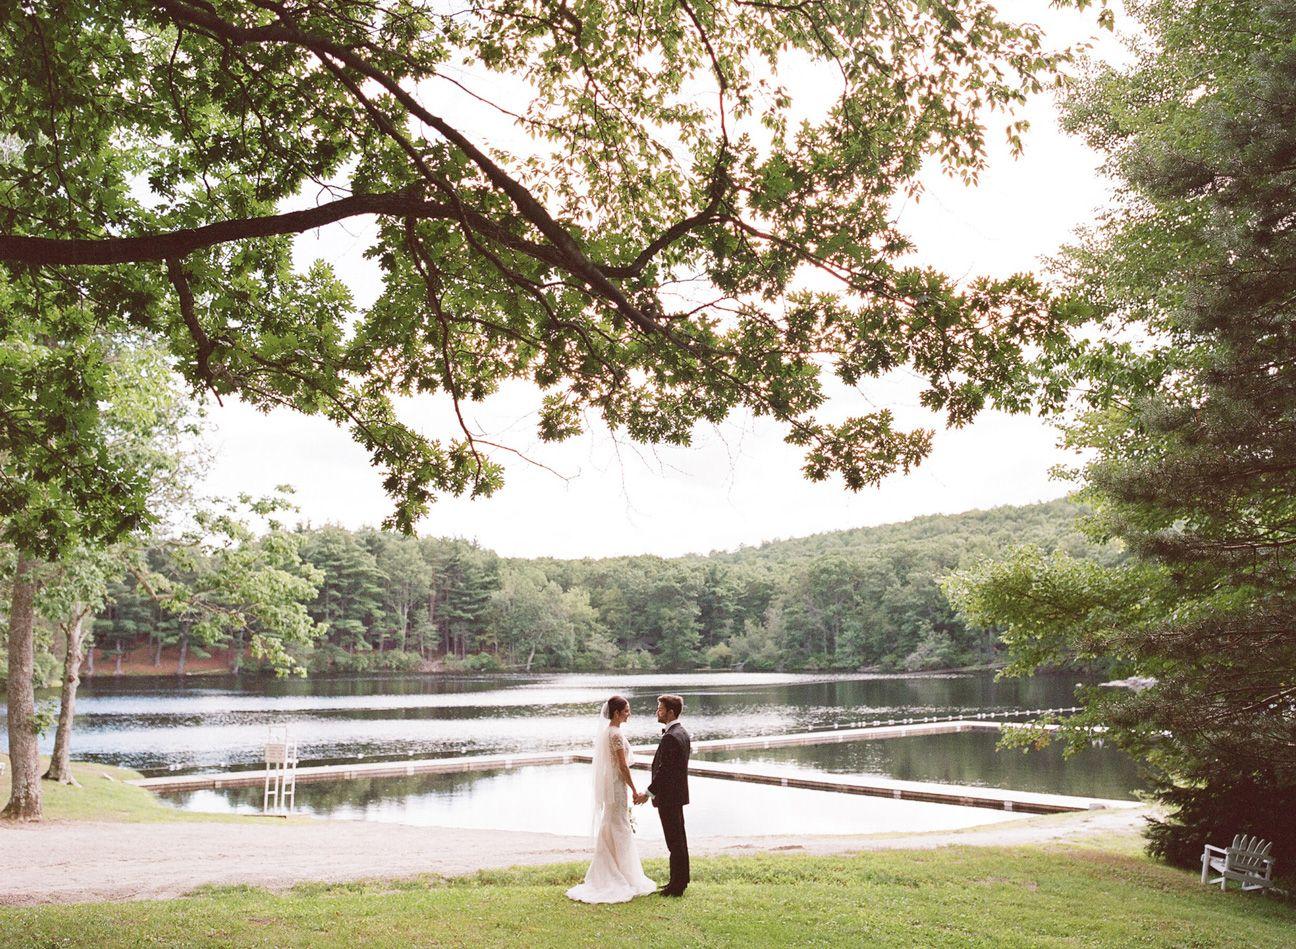 KarenHillPhotography-Parizat-Wedding-0244.jpg